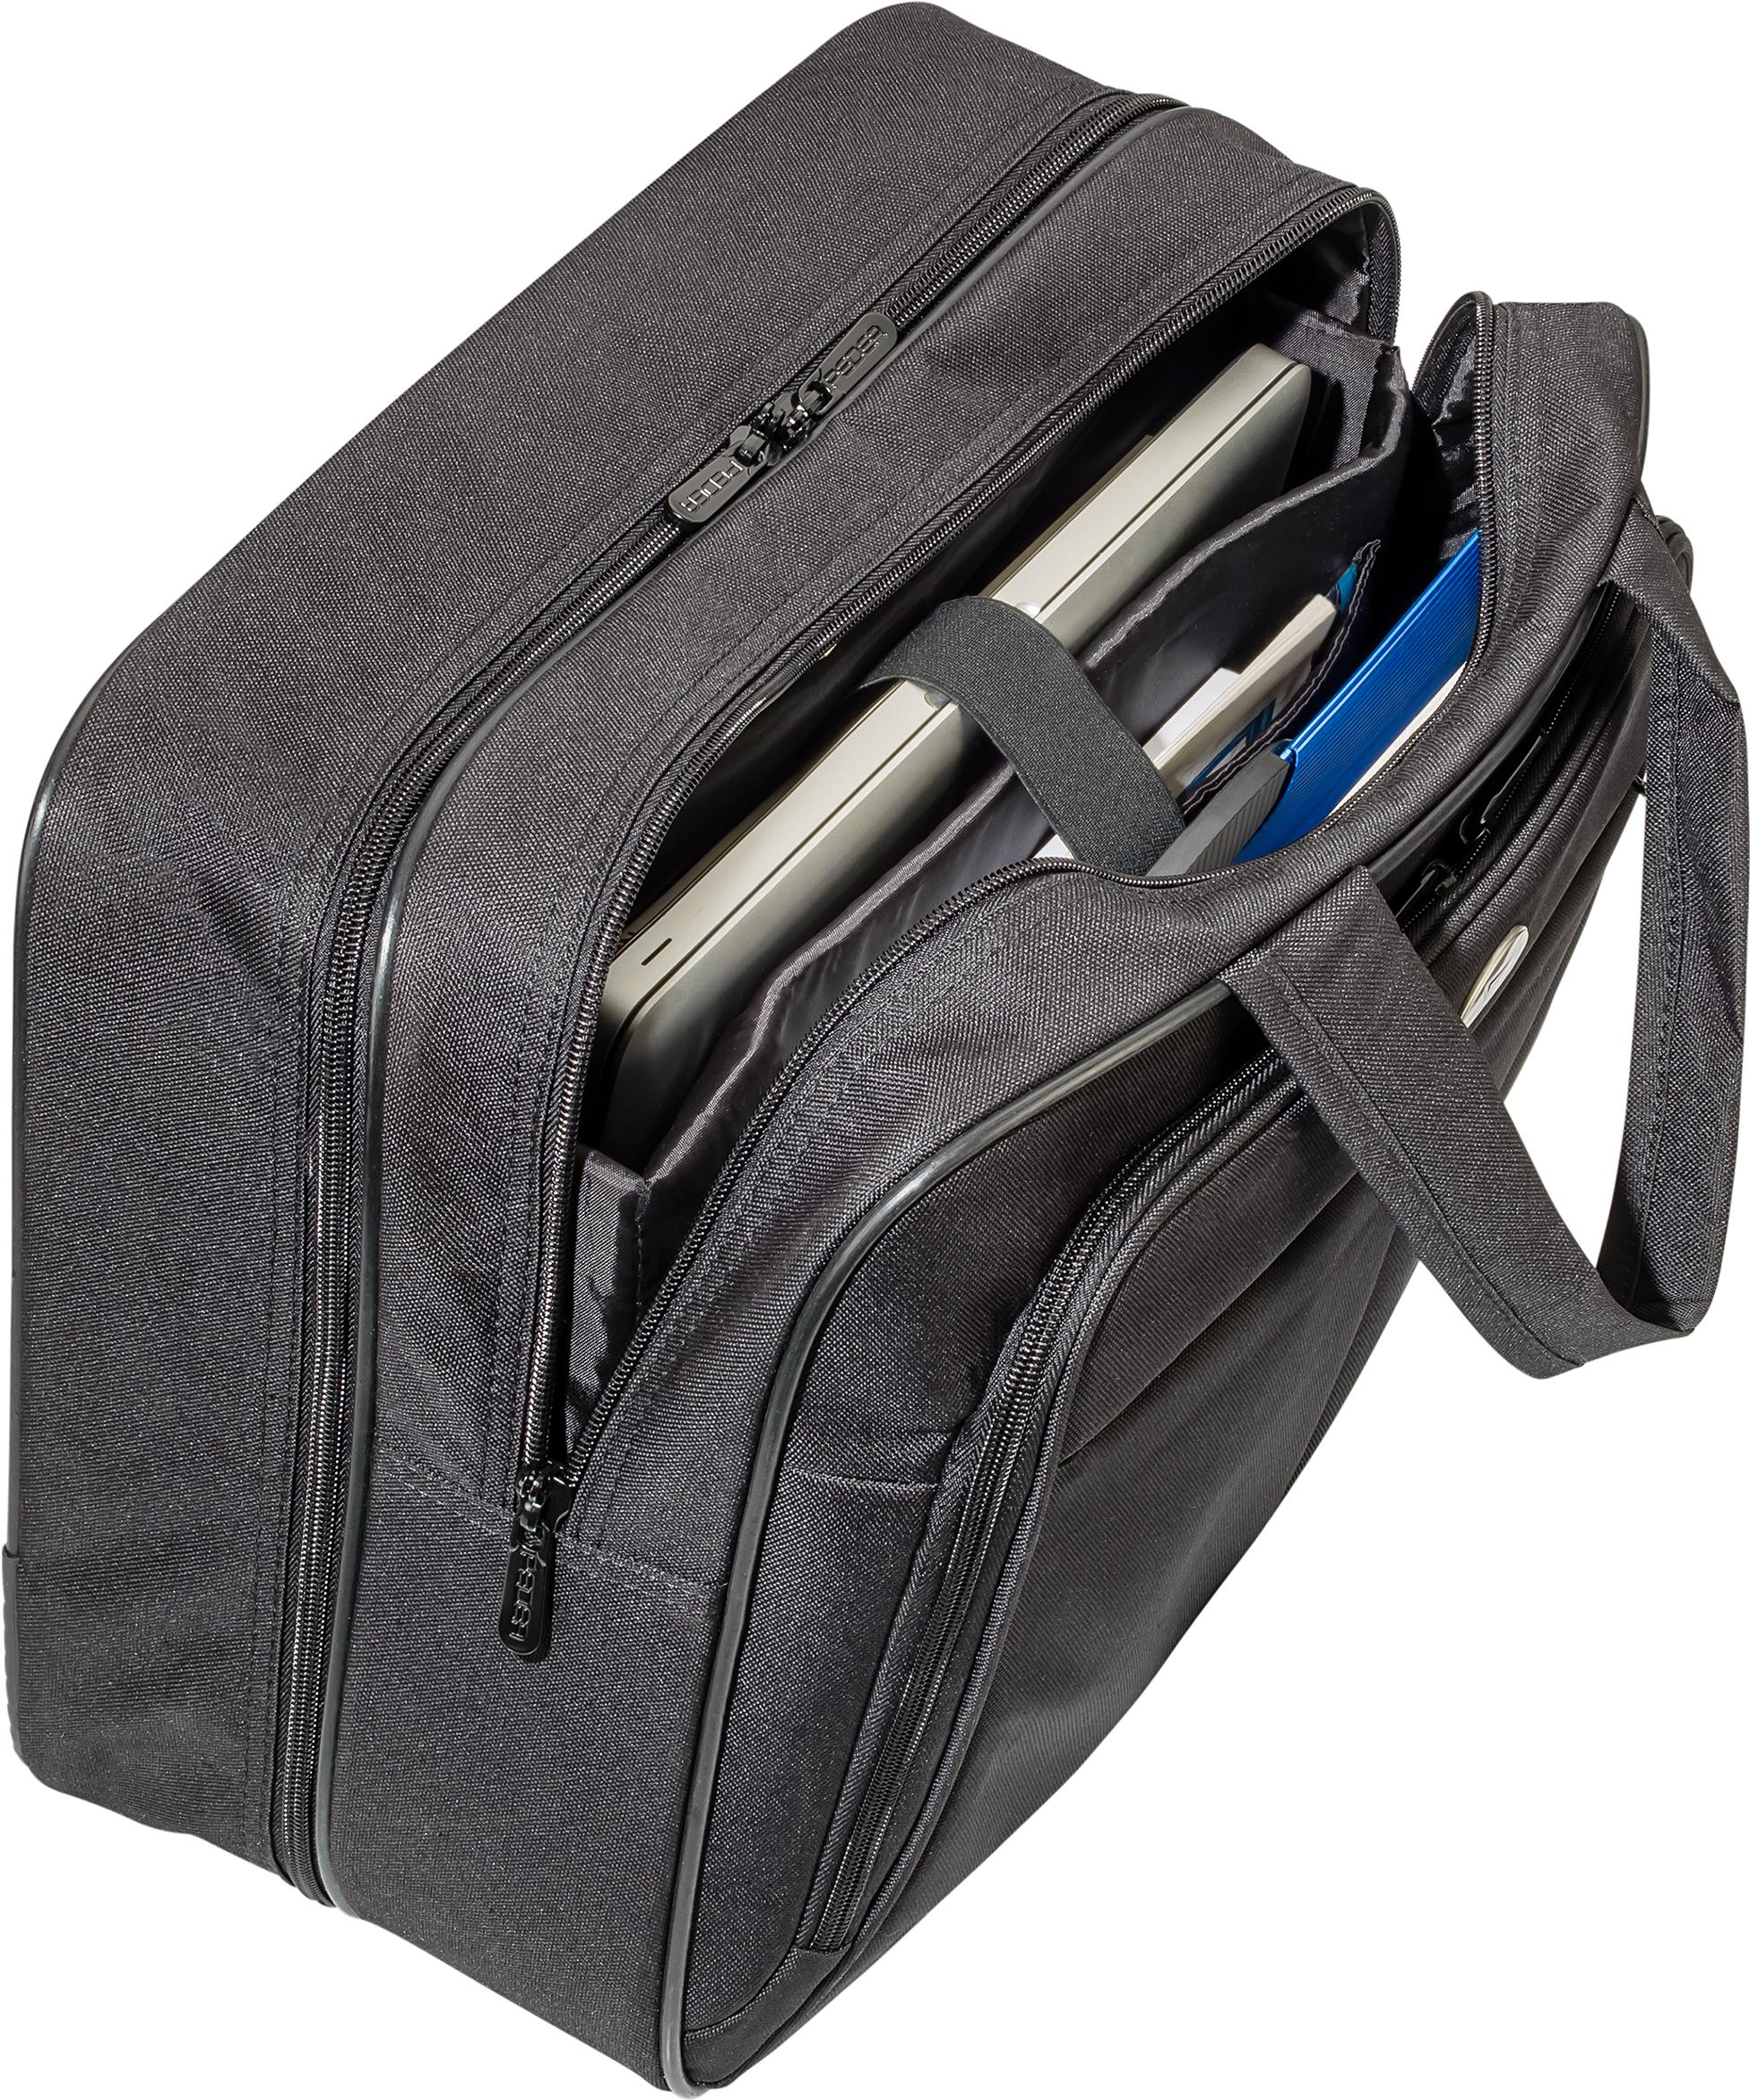 Computertaschen - PEDEA NBTrolley PREMIUM AIR Notebook Tasche 43,9 cm (17.3') Schwarz (66066255)  - Onlineshop JACOB Elektronik